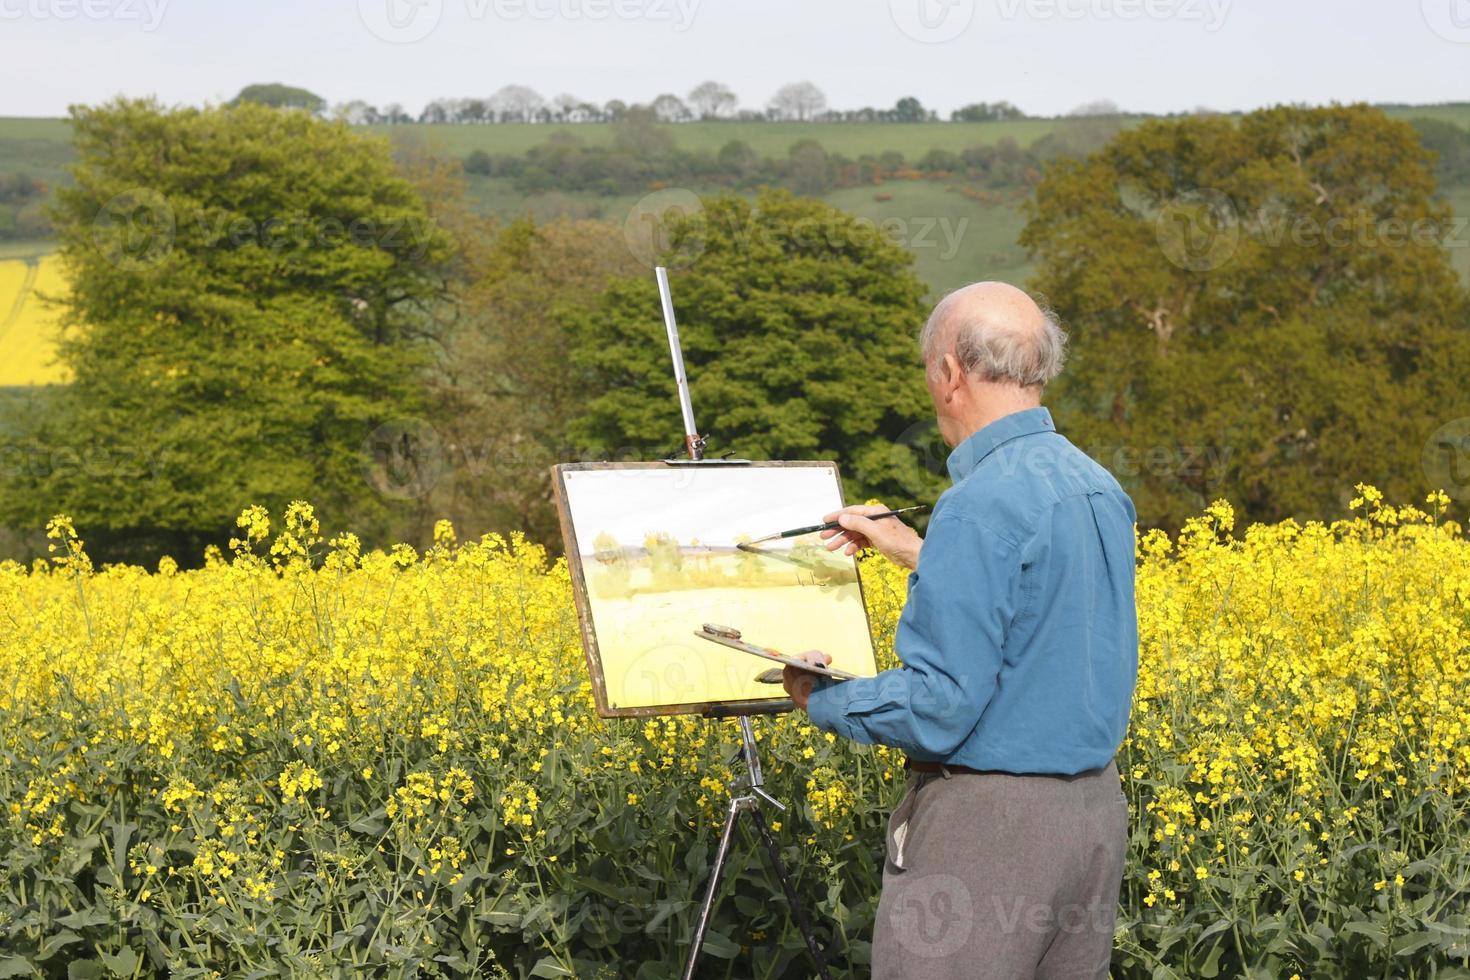 A senior male artist painting a beautiful landscape photo